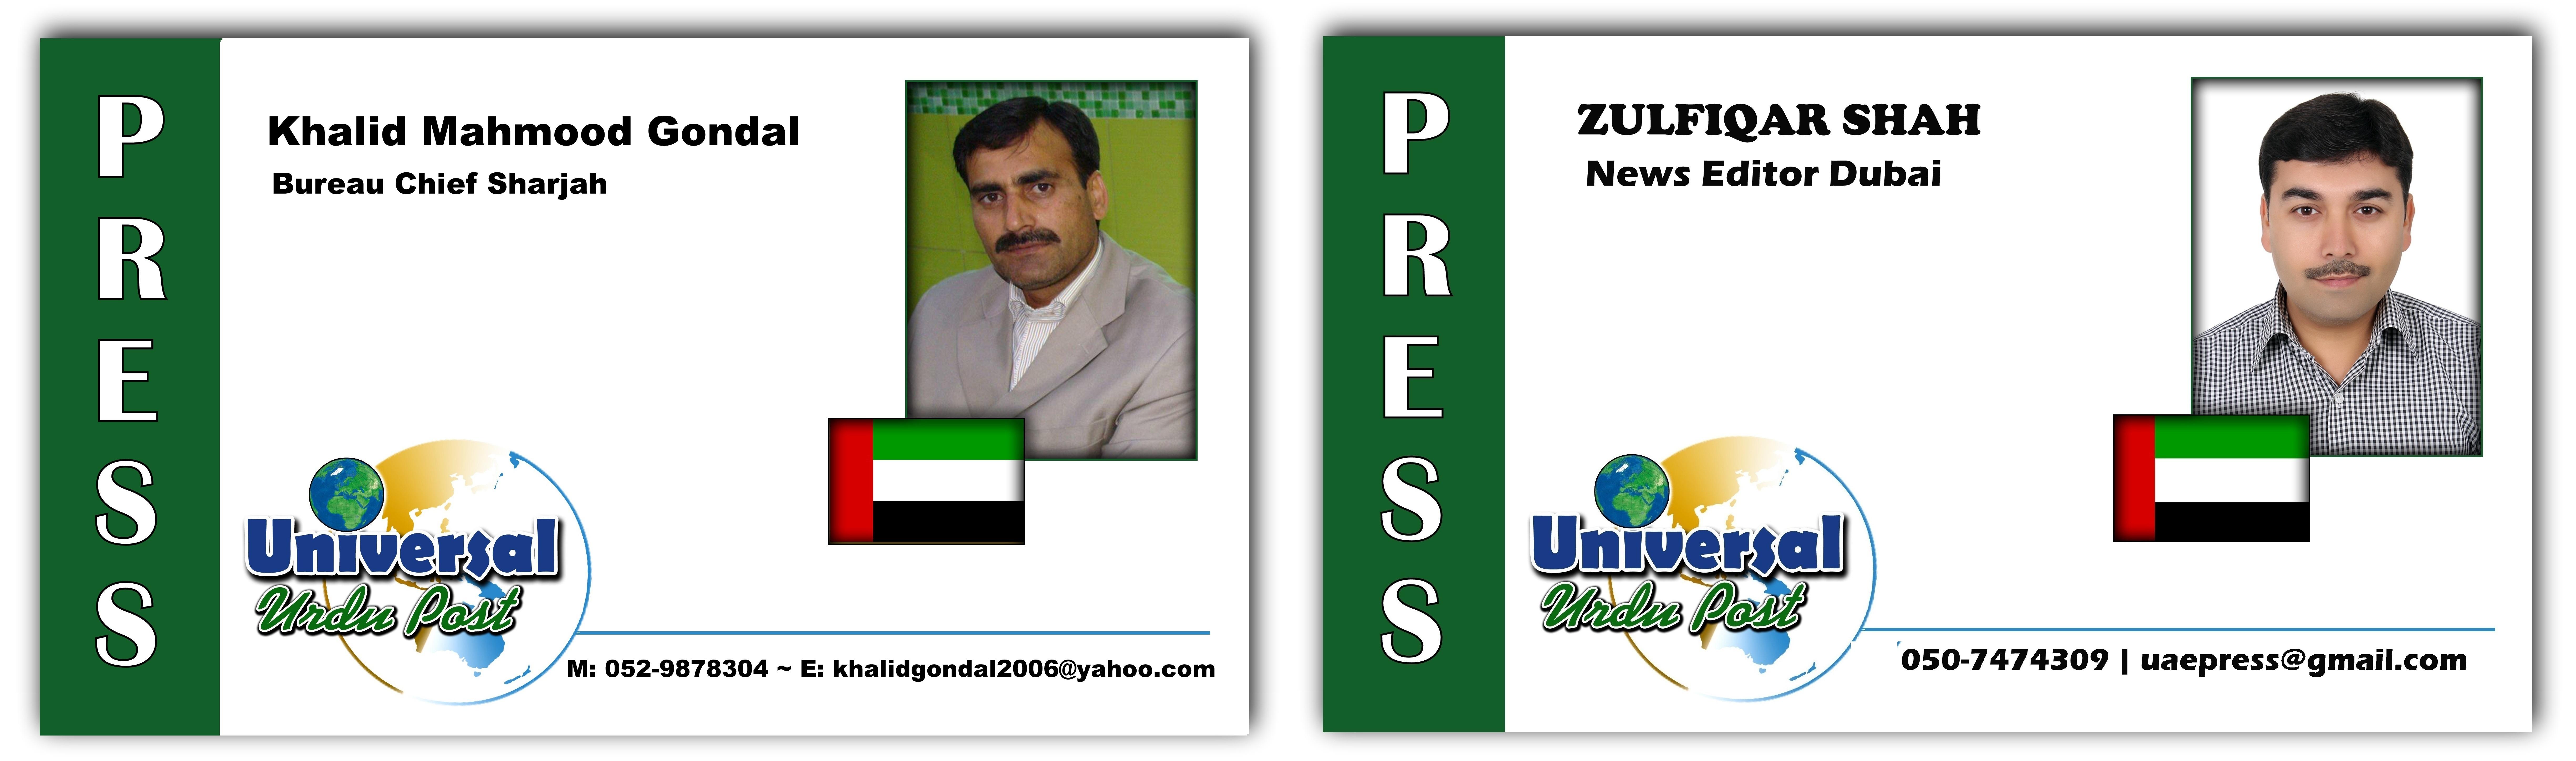 Zulfiqar Shah and Khalid Gondal